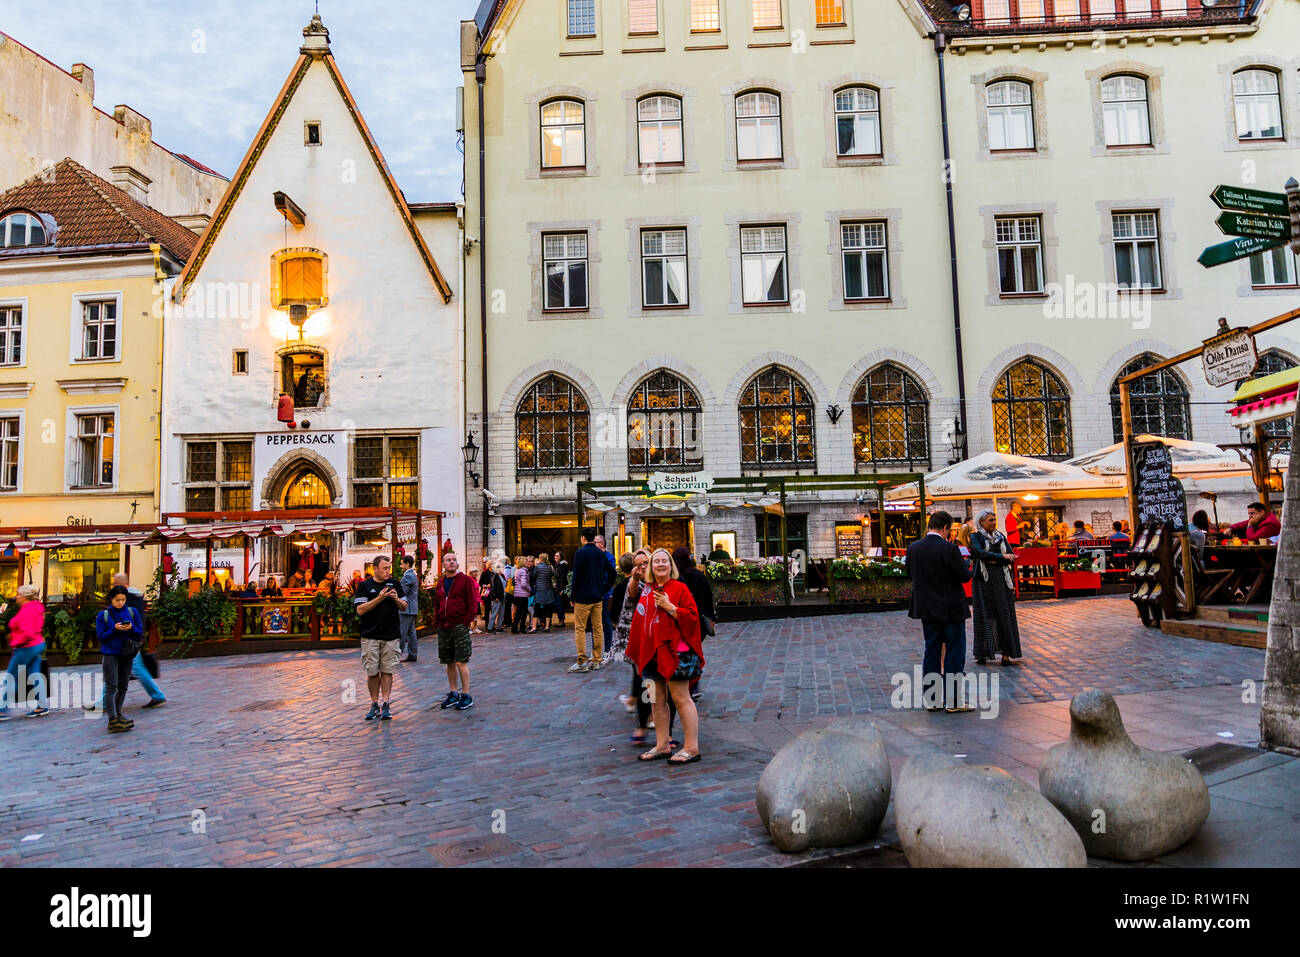 Tallinn Old City at nightfall. Tallinn, Harju County, Estonia, Baltic states, Europe. - Stock Image